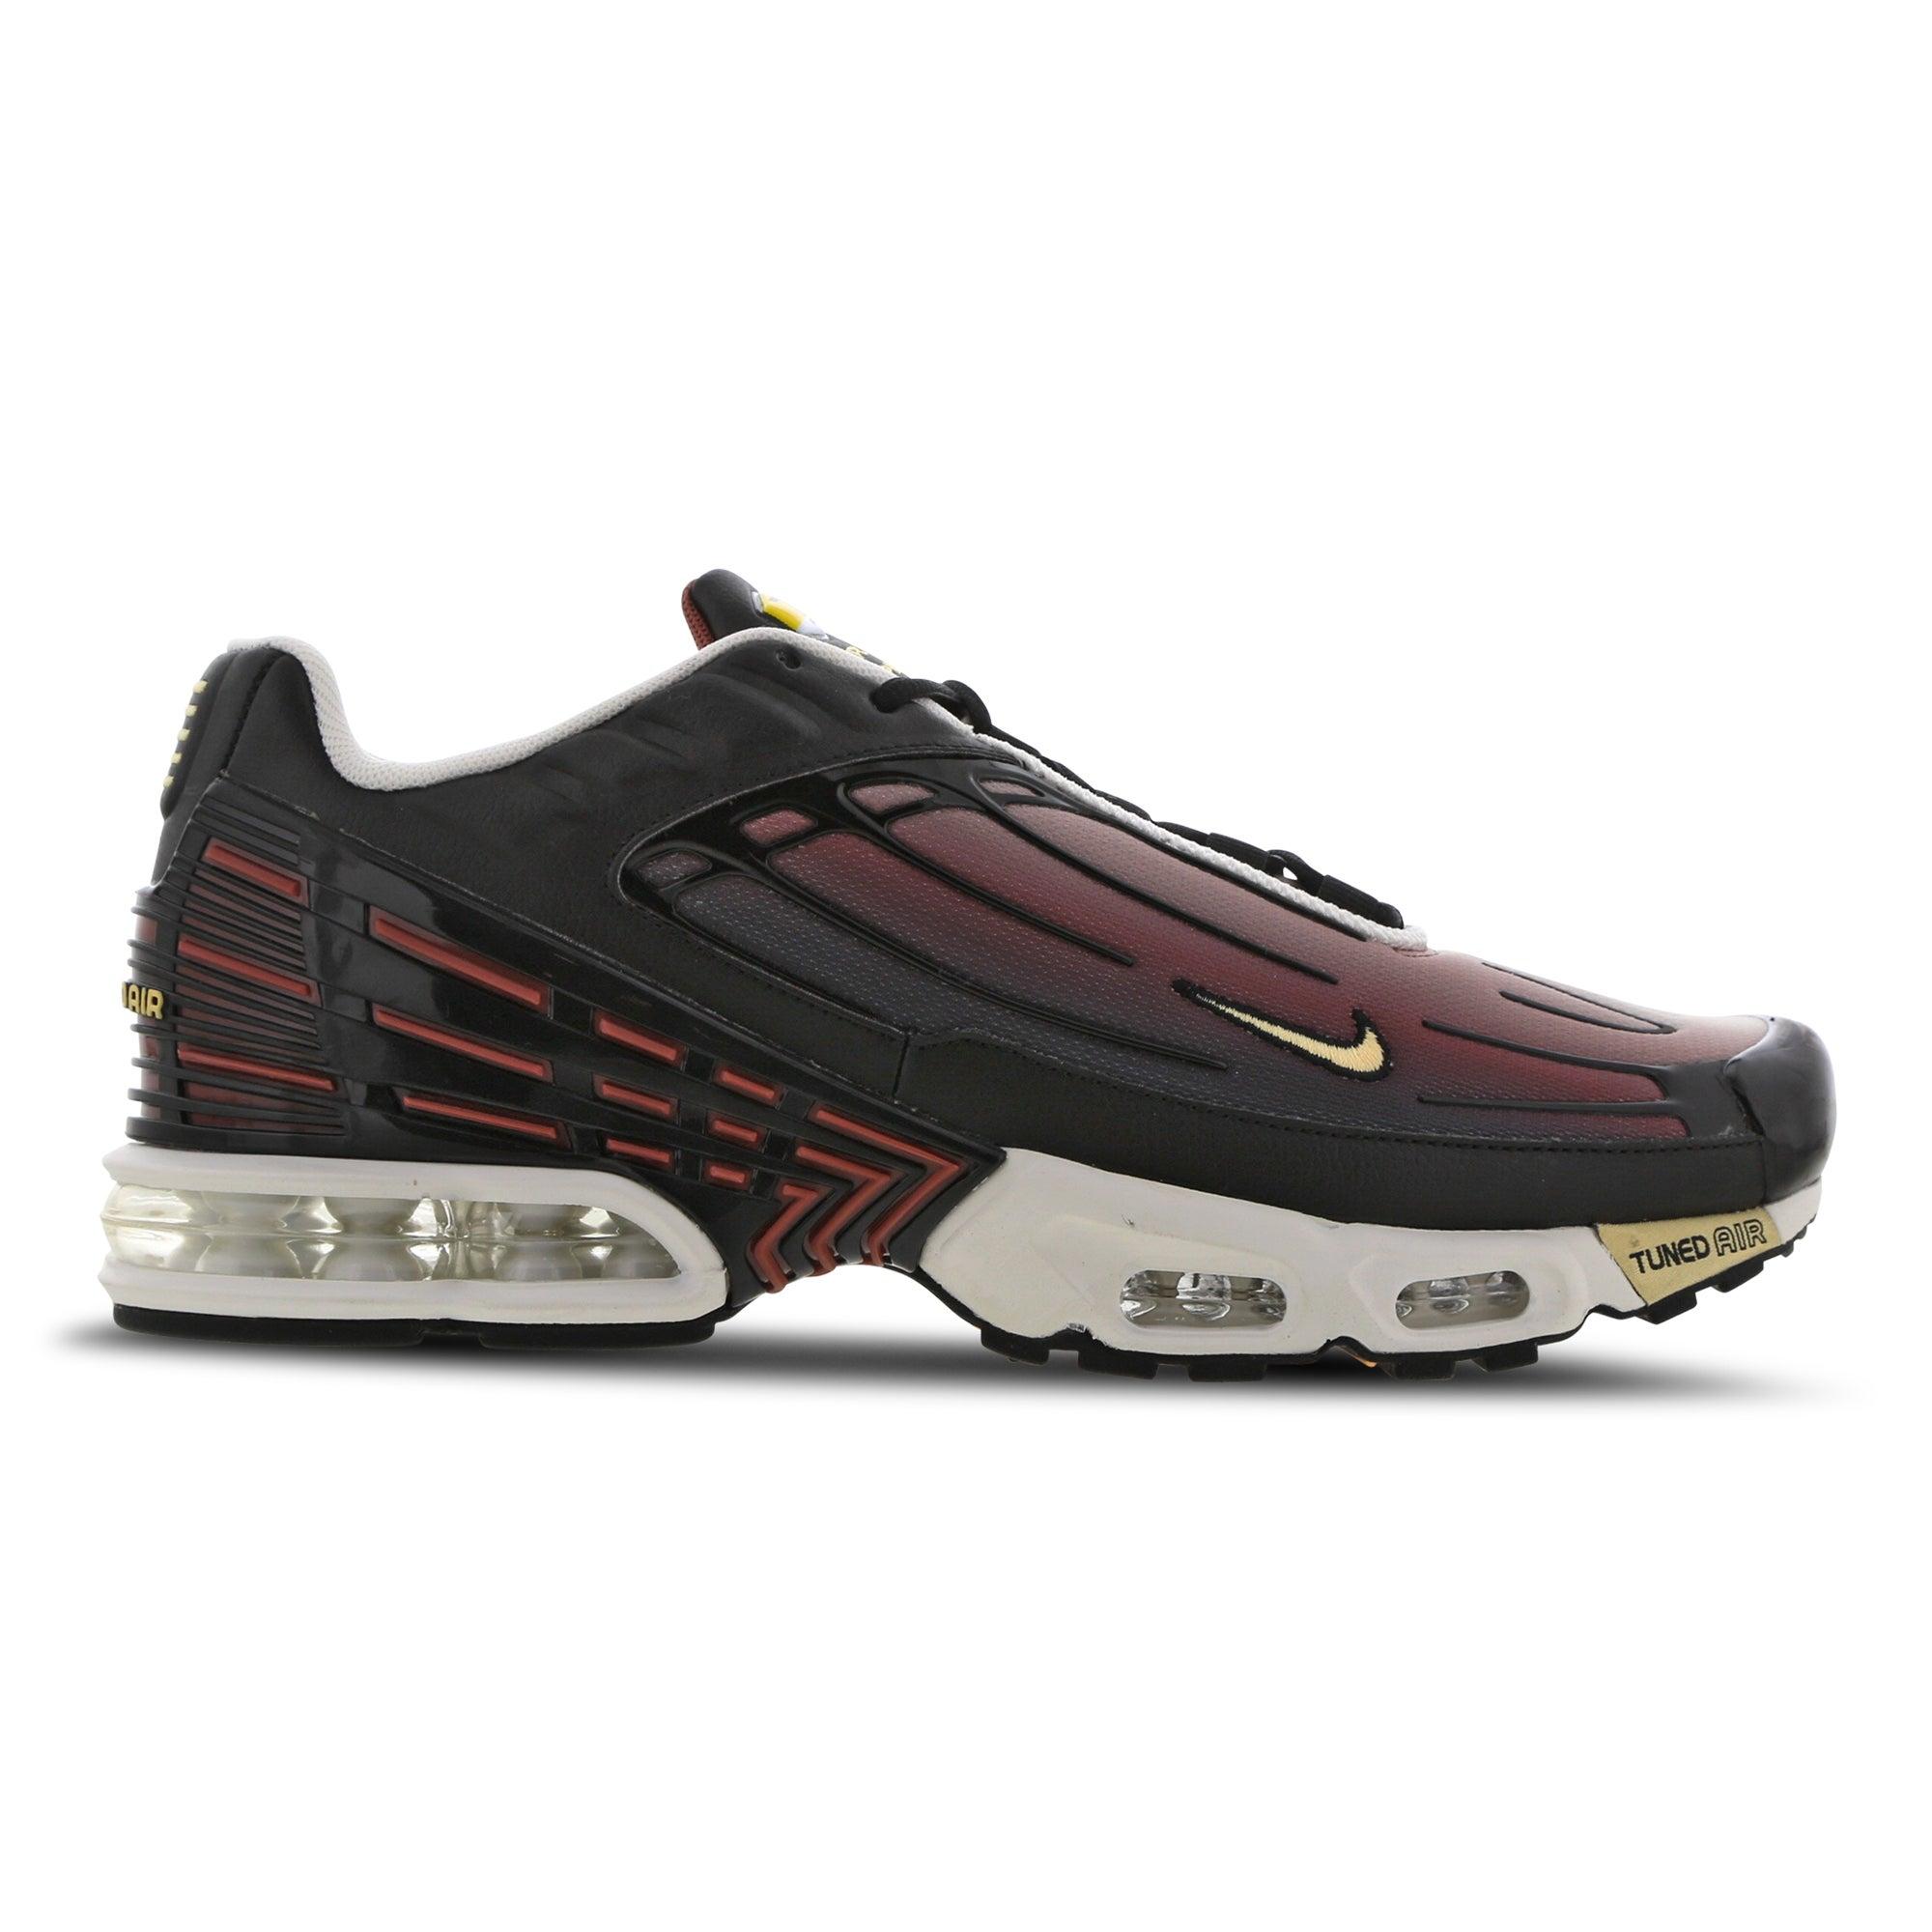 Nike Tuned 3 Shoes